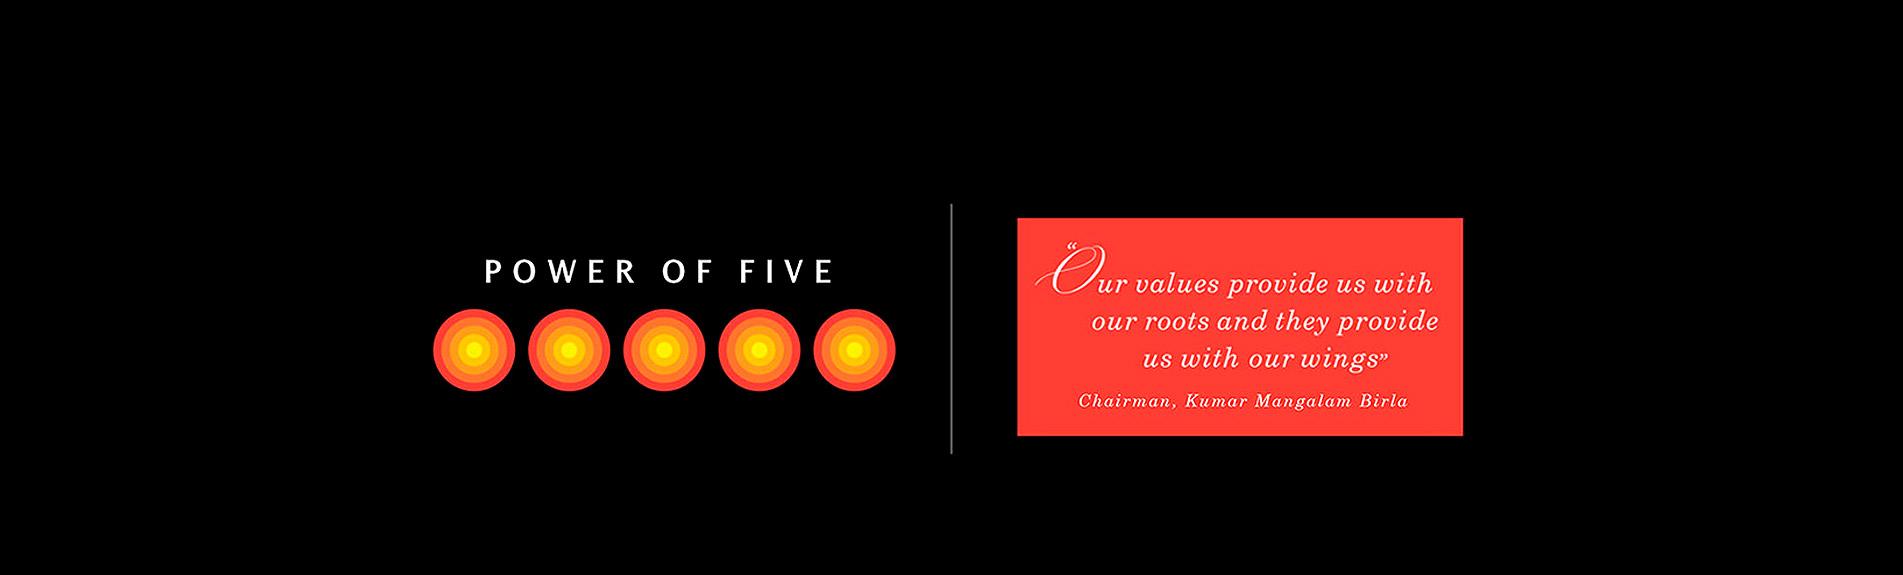 visions and values aditya birla group